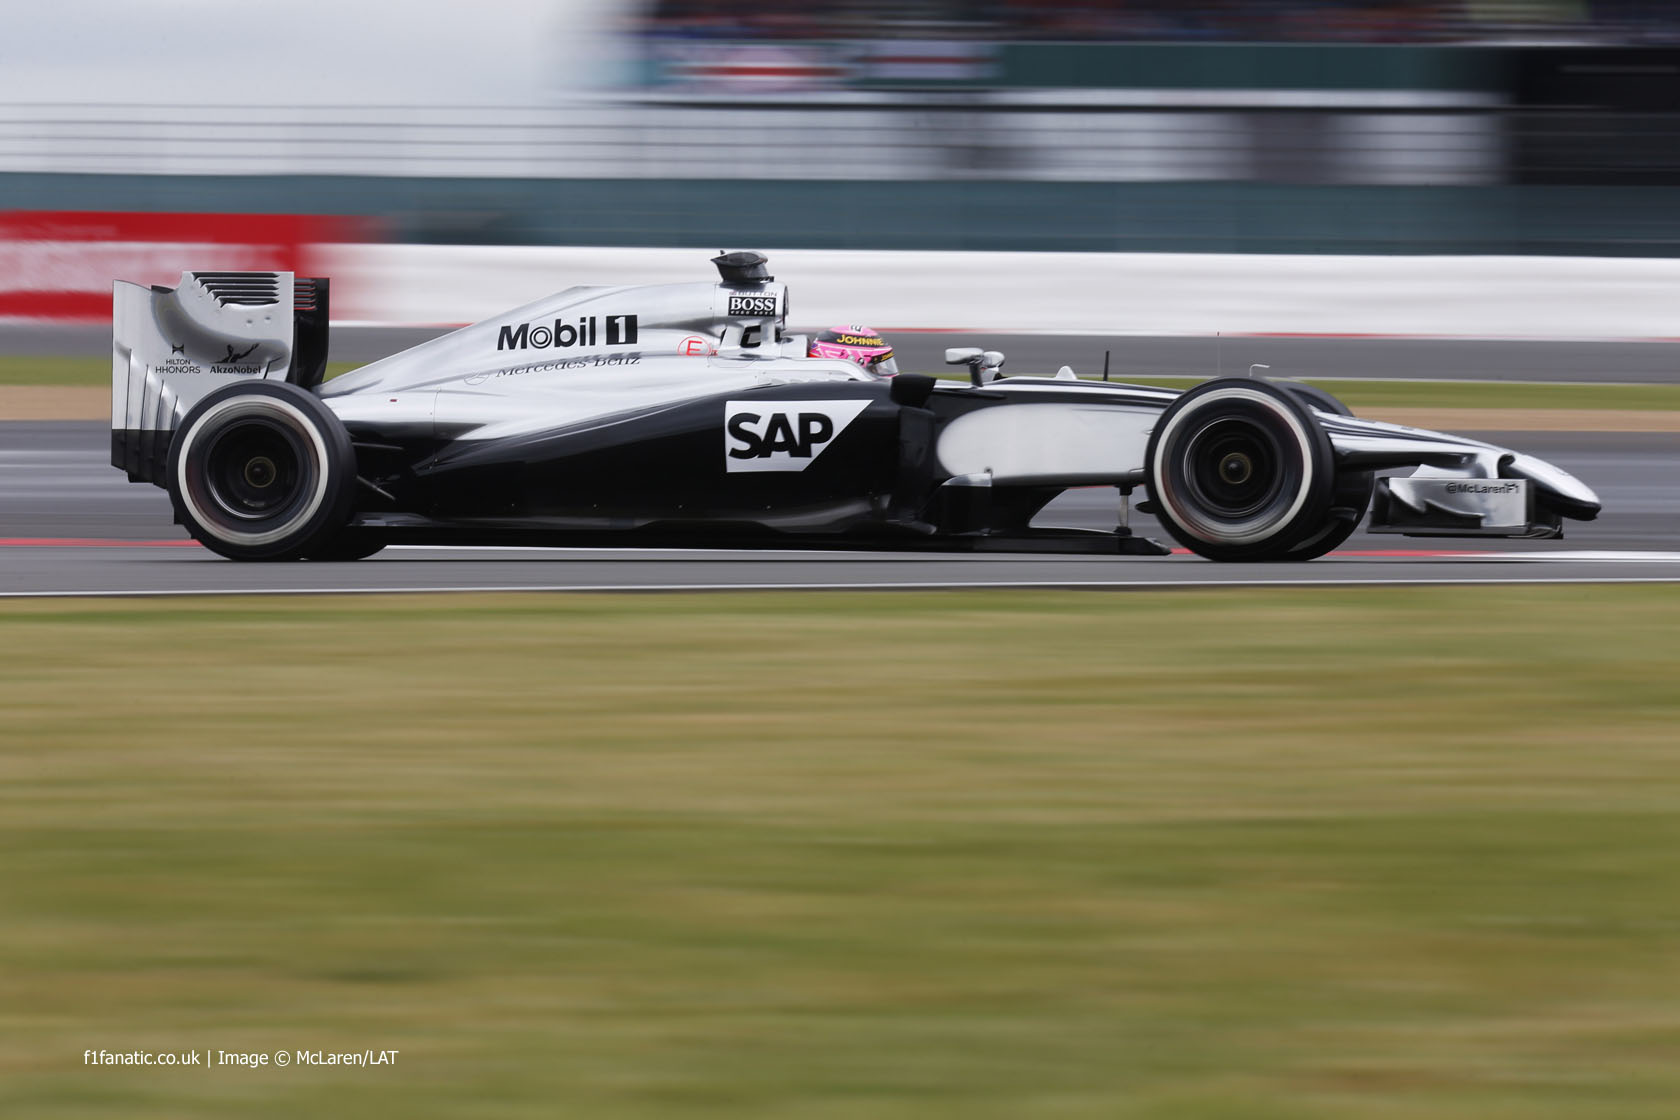 Jenson Button, McLaren, Silverstone, 2014